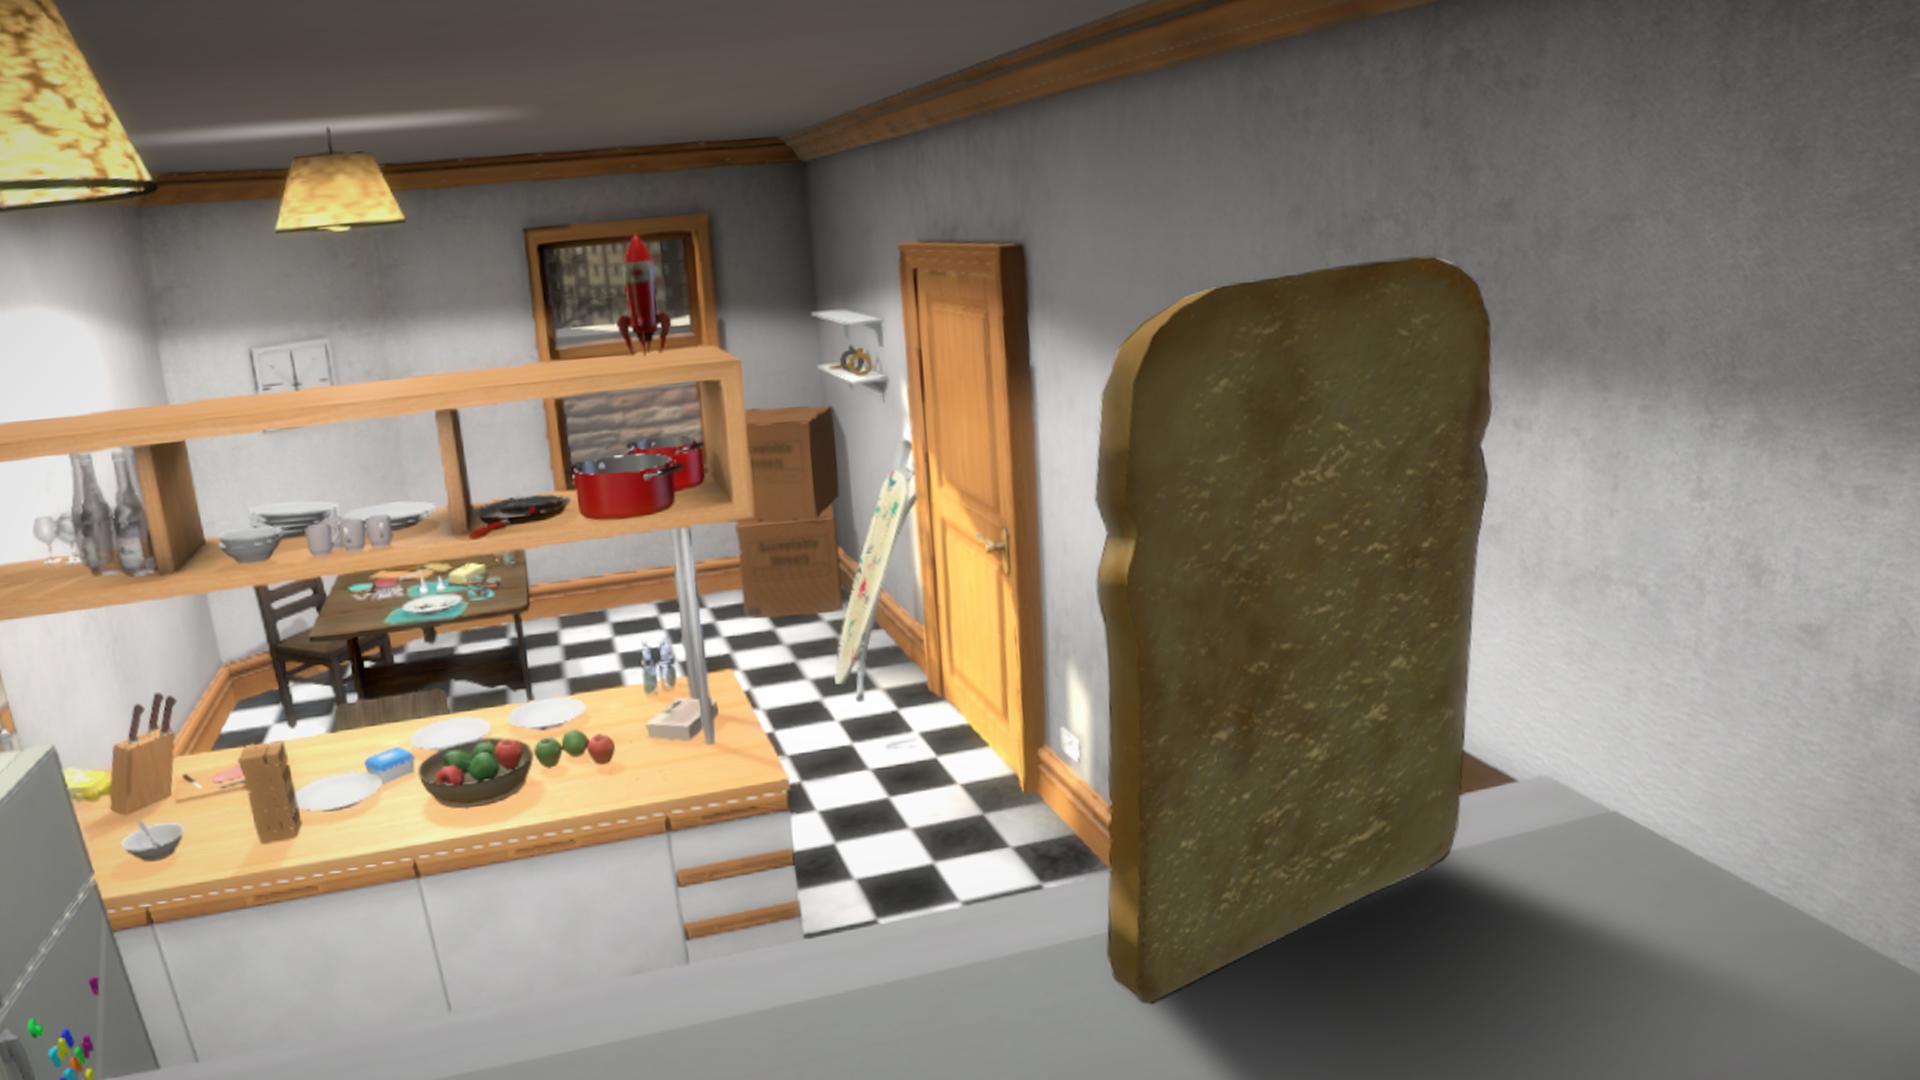 High Resolution Wallpaper | I Am Bread 1920x1080 px